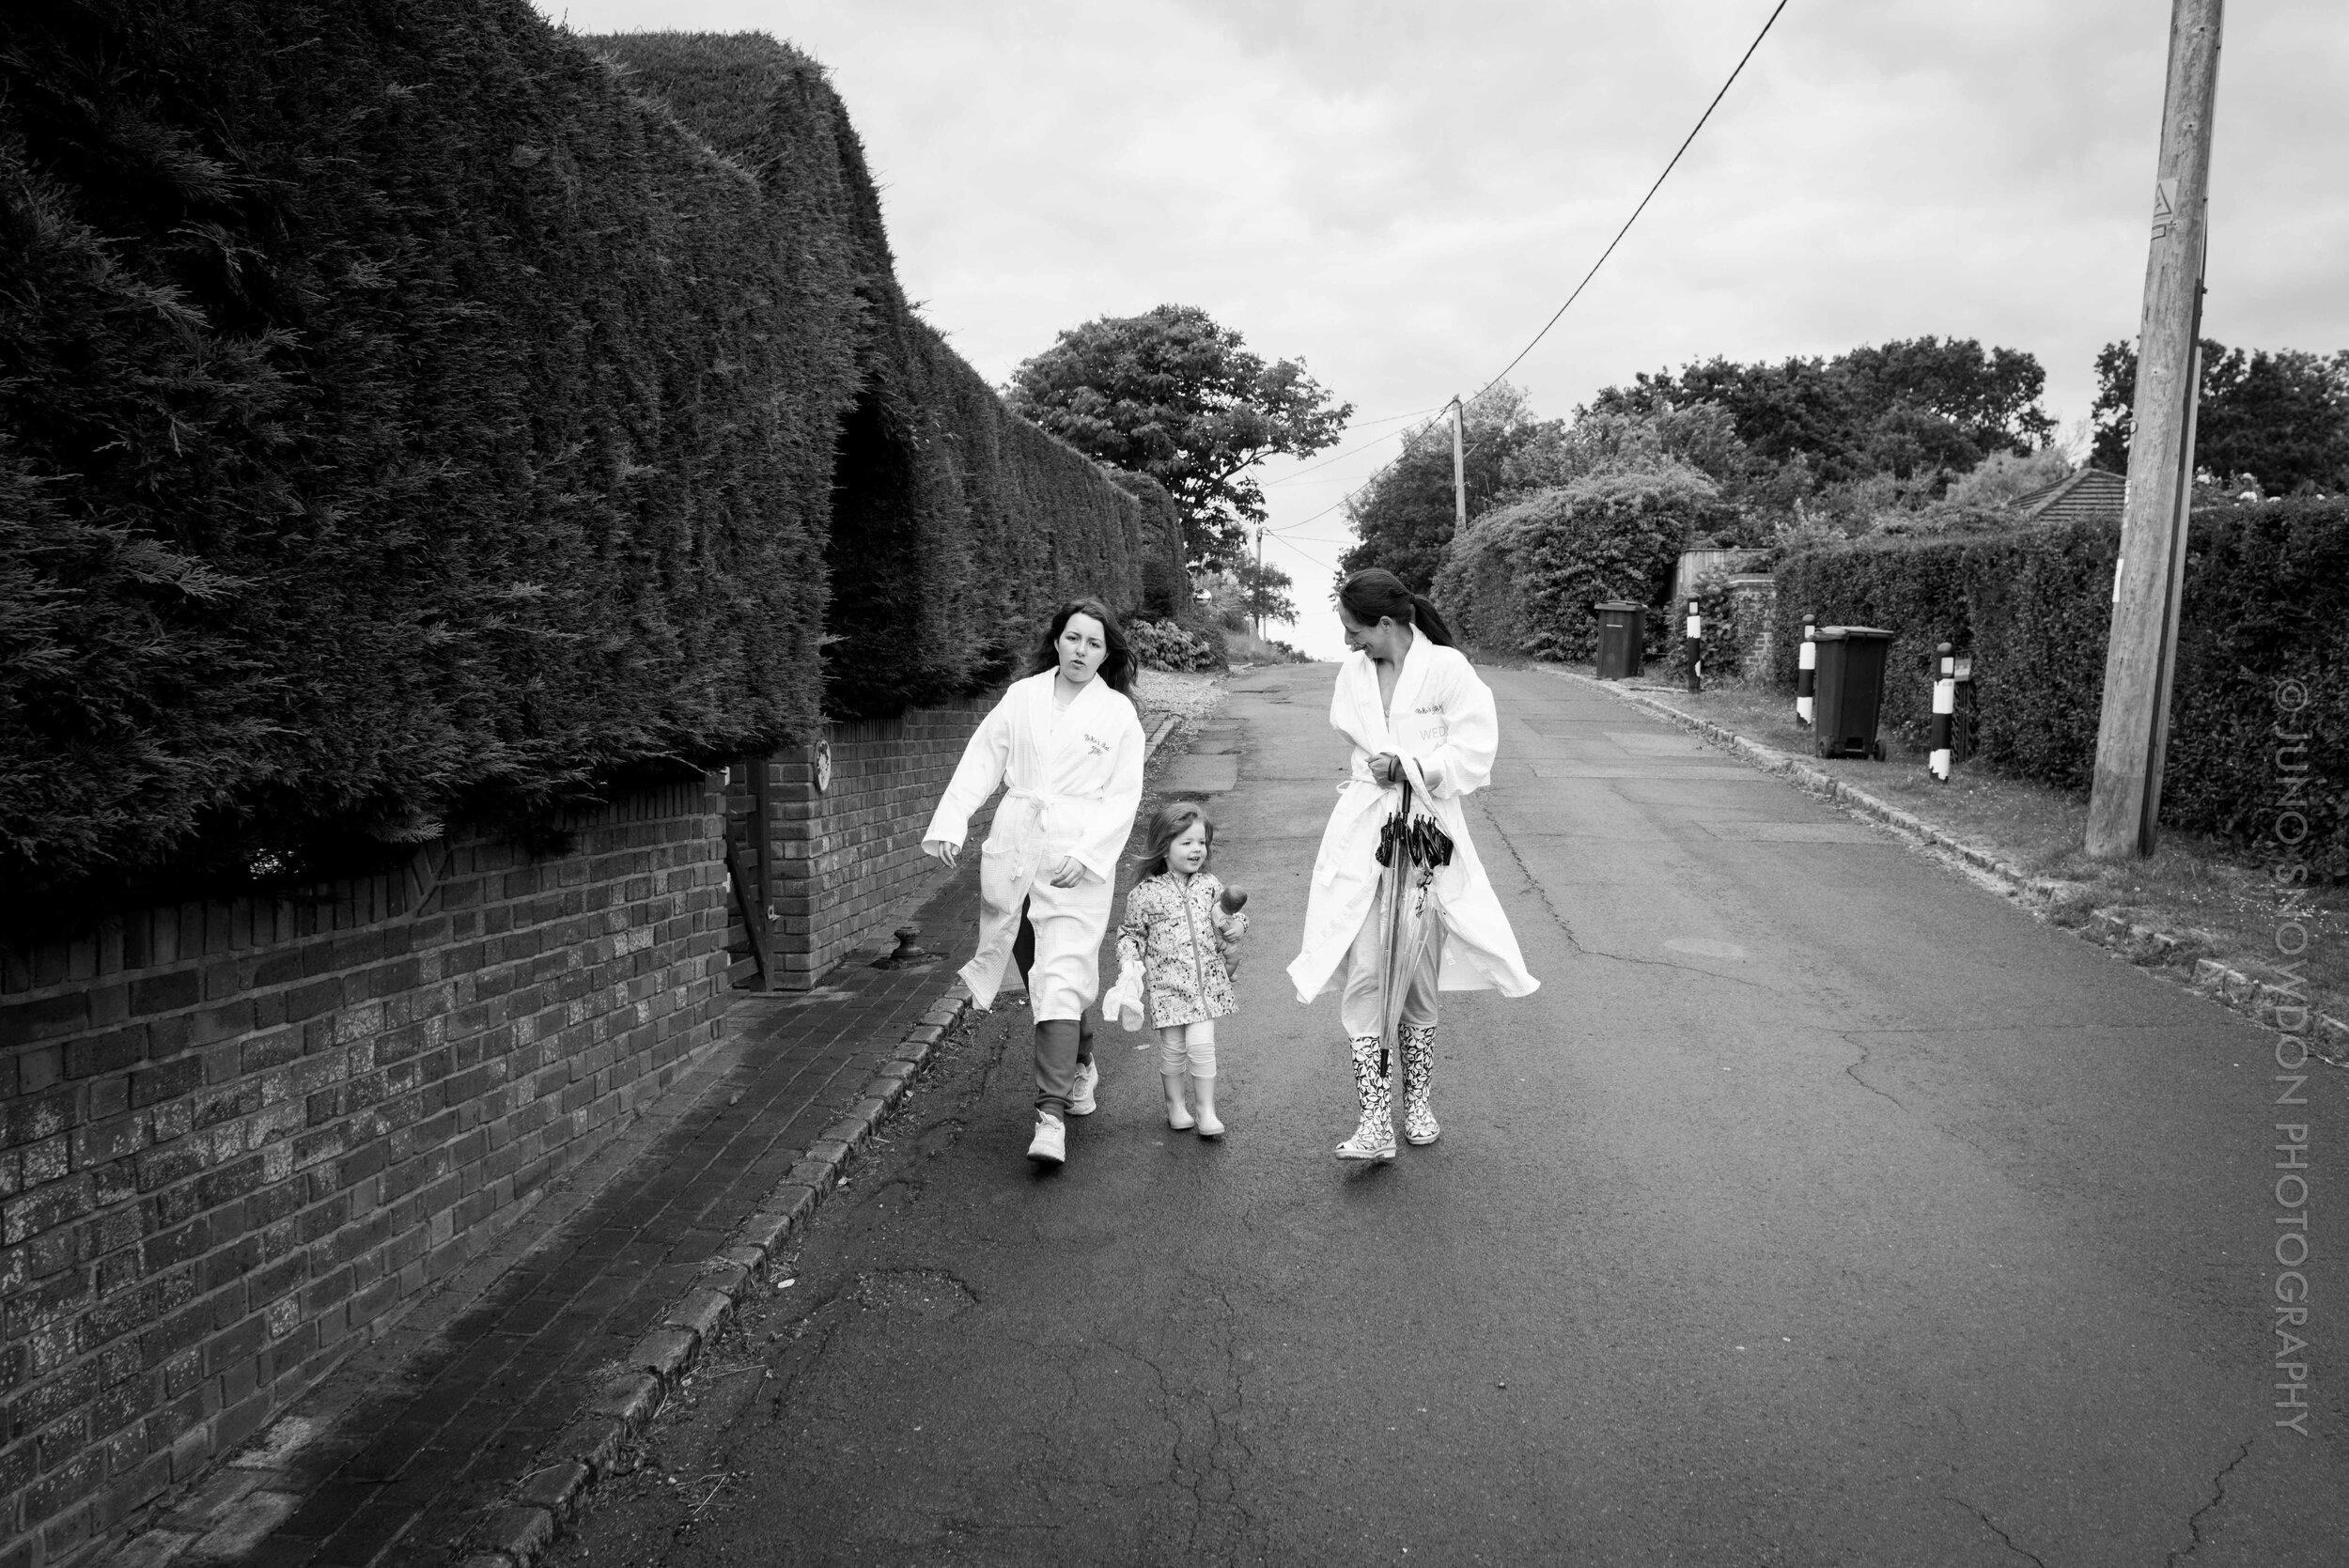 juno-snowdon-photography-wedding-6994.jpg